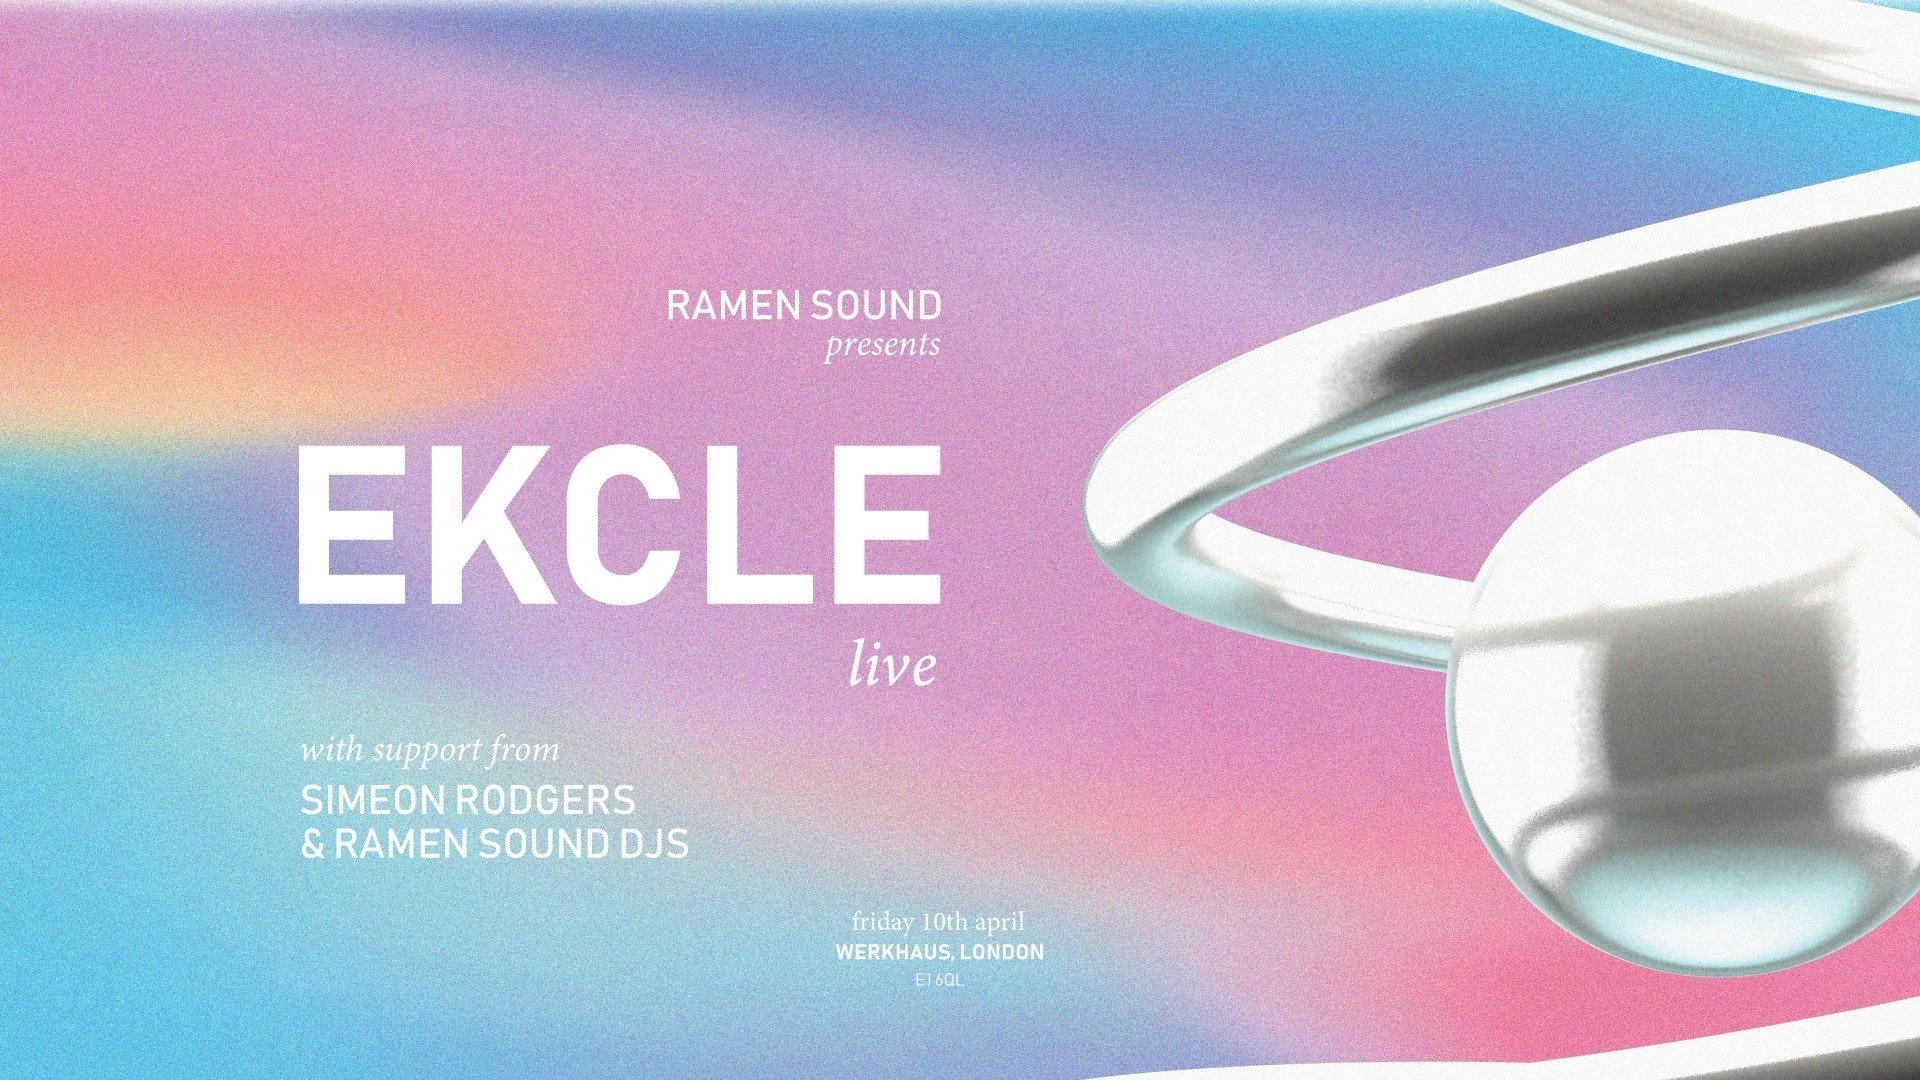 EKCLE (Live)